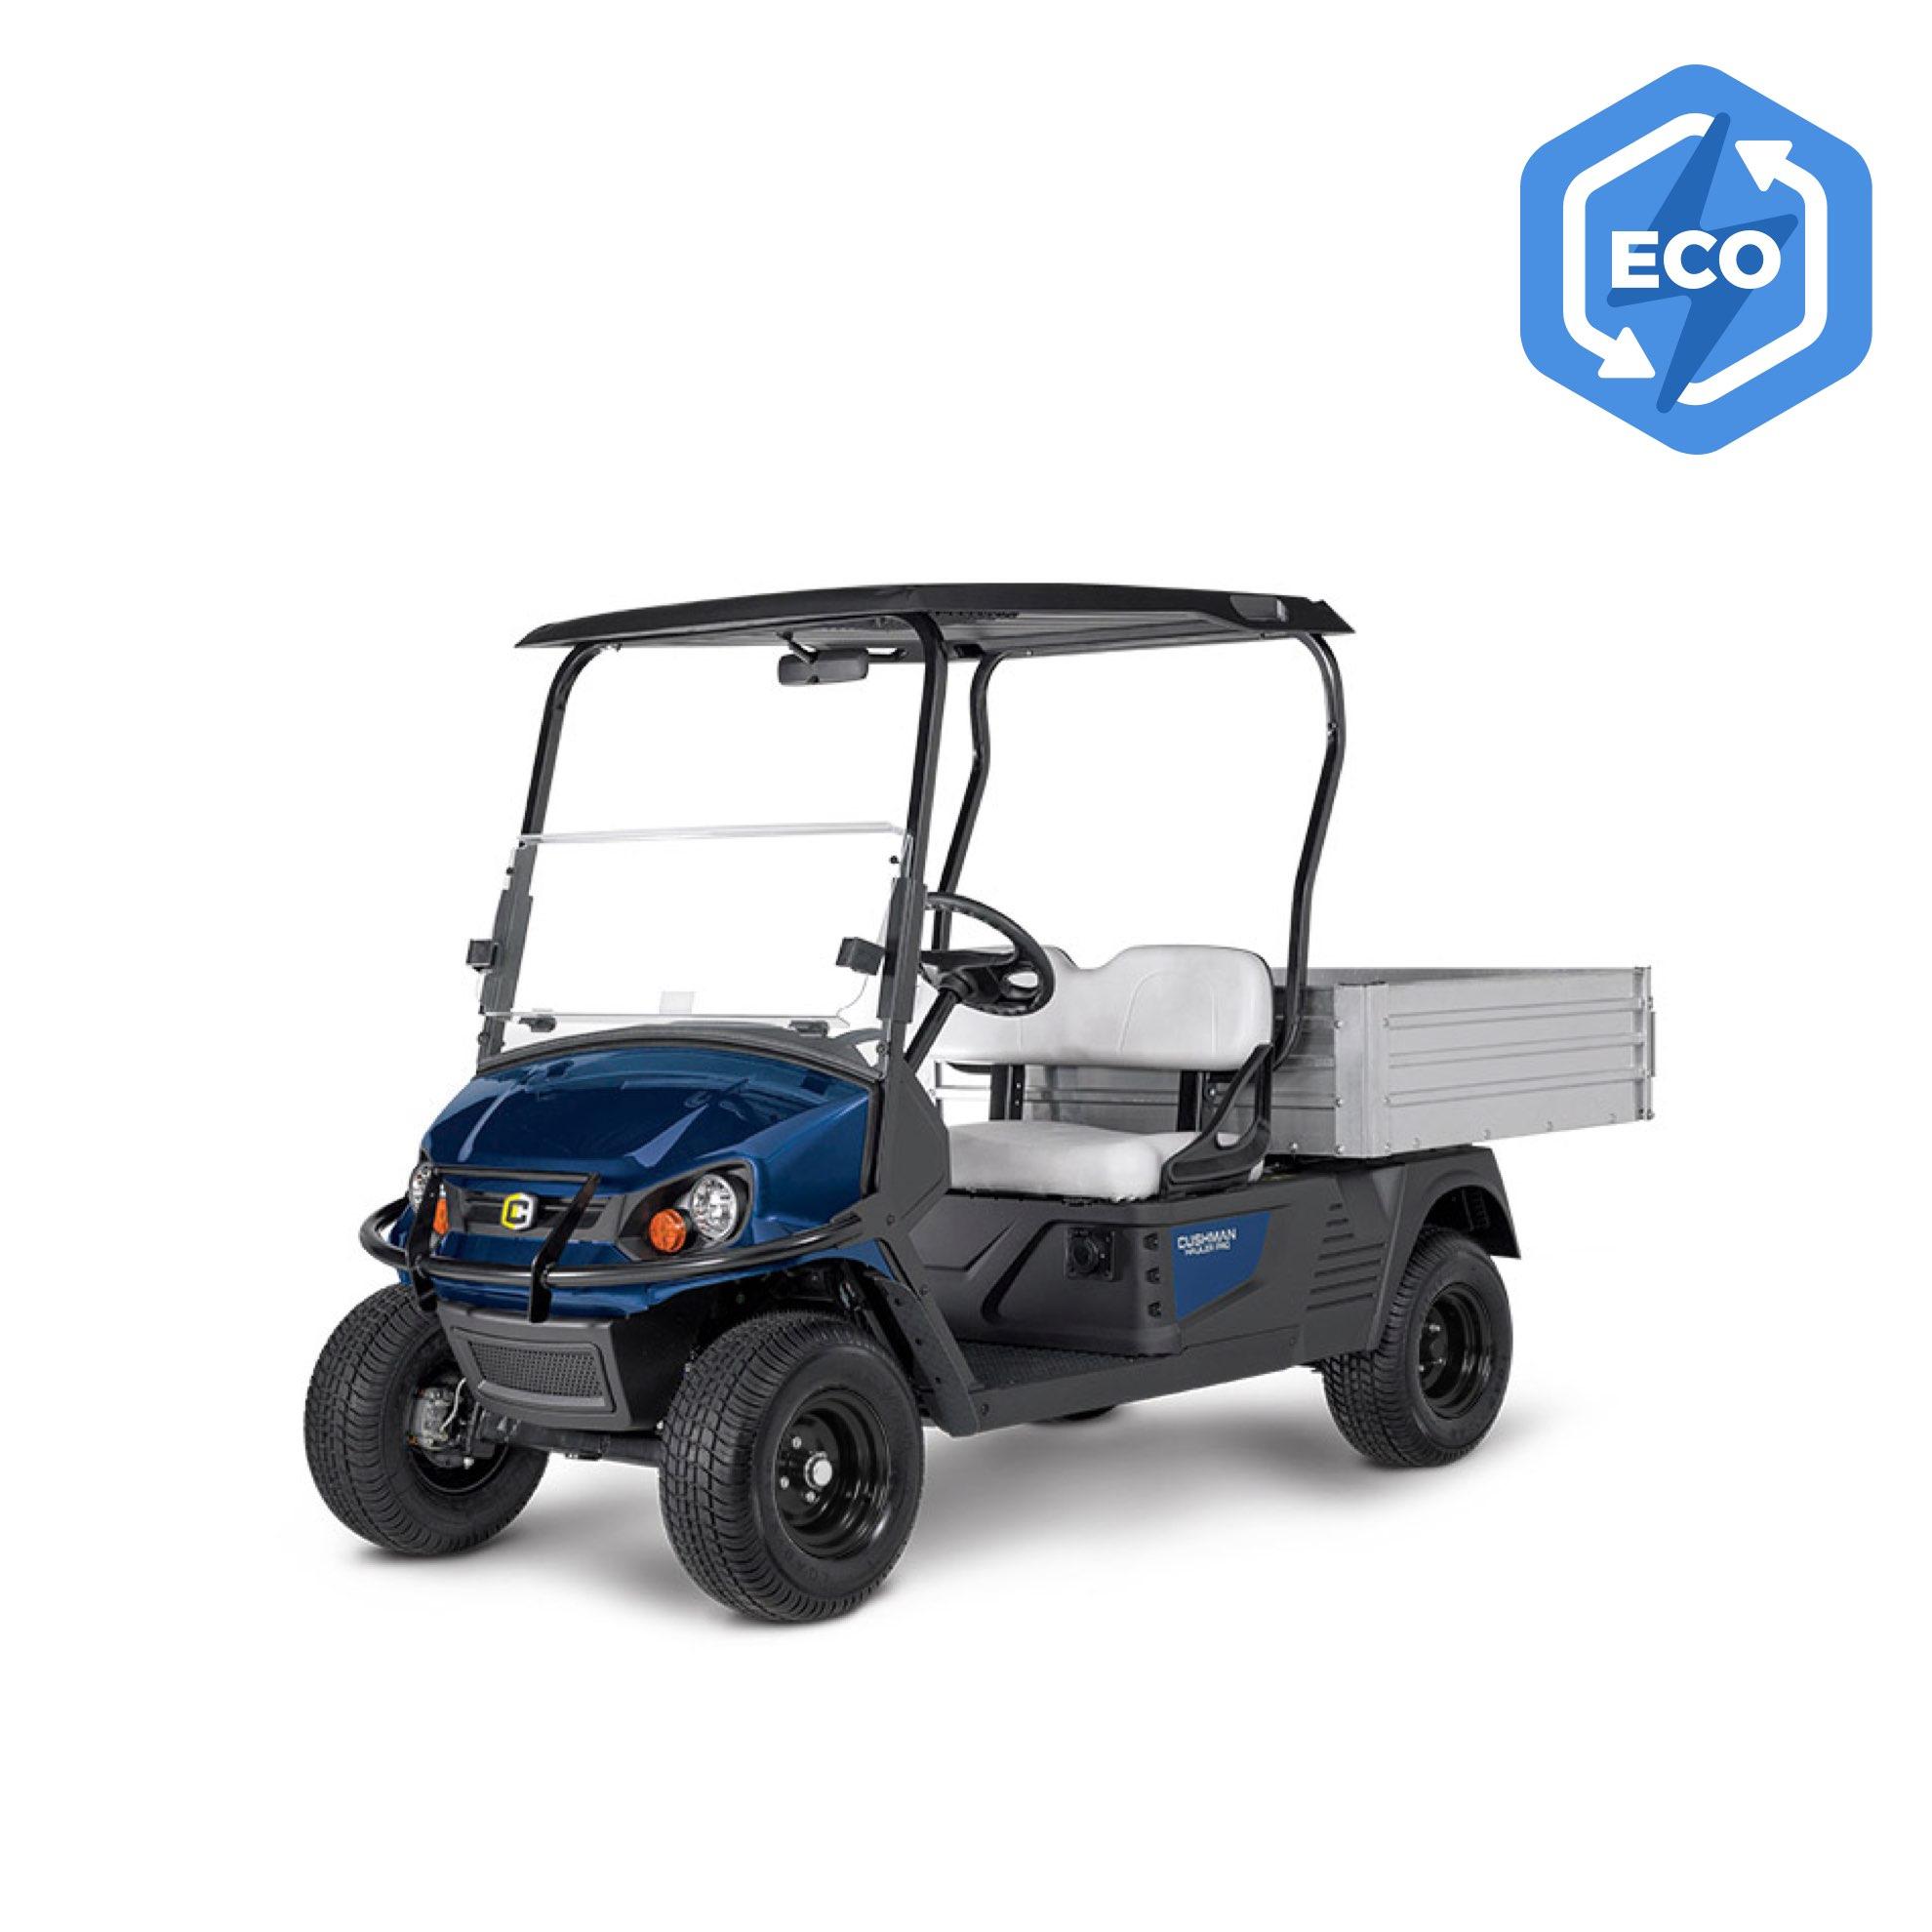 Cushman Hauler PRO Battery-powered All-terrain Vehicle